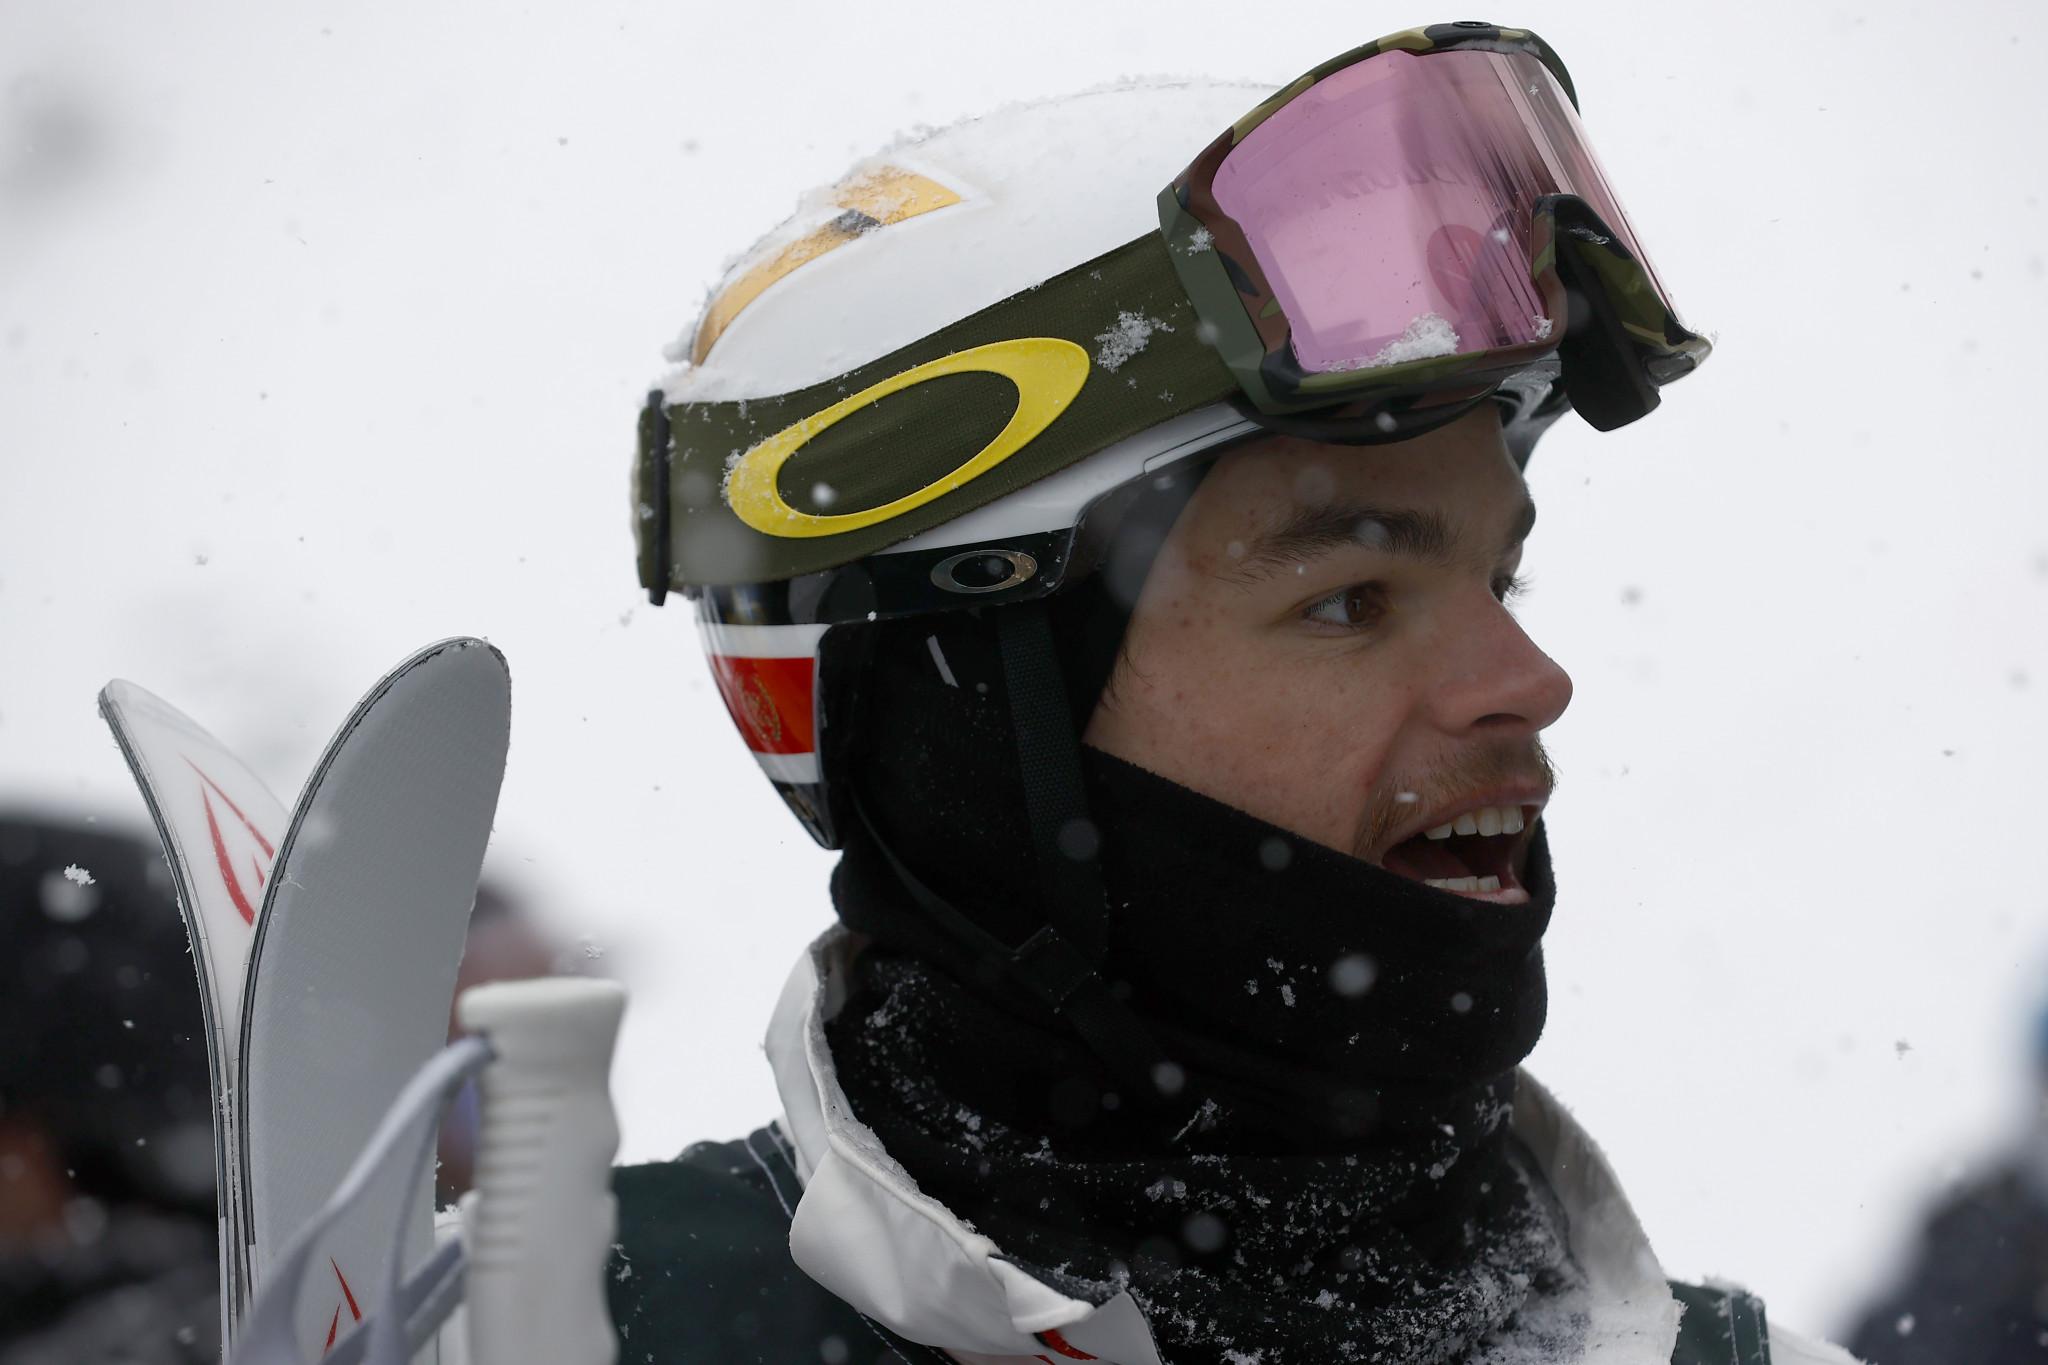 Kingsbury and Laffont crowned moguls champions at FIS Freestyle Ski World Championships